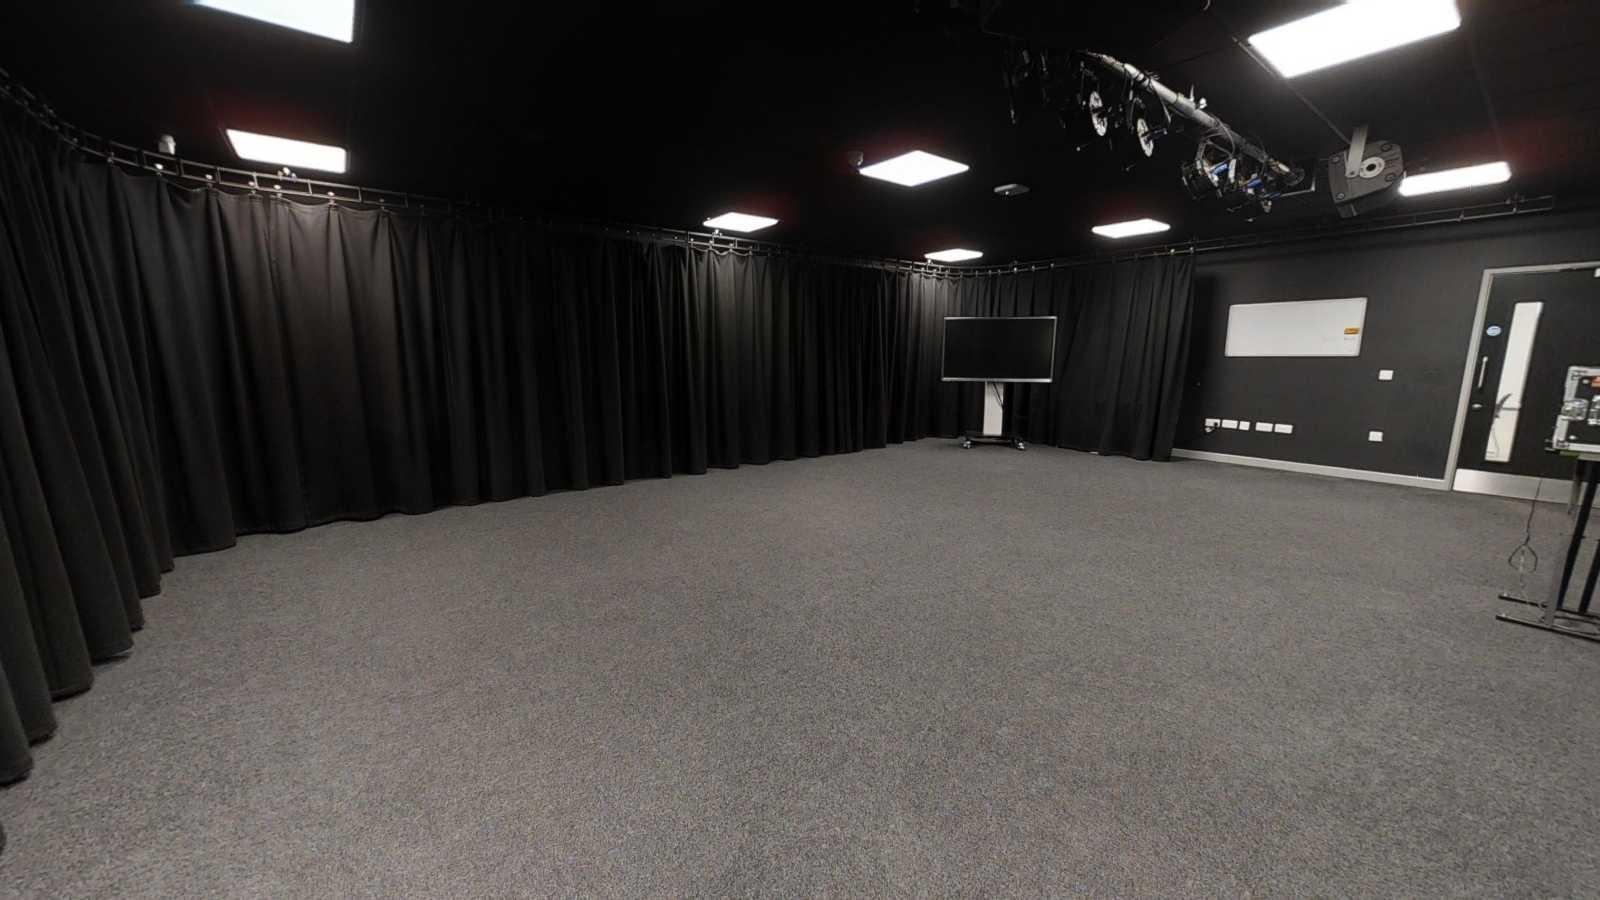 Drama room